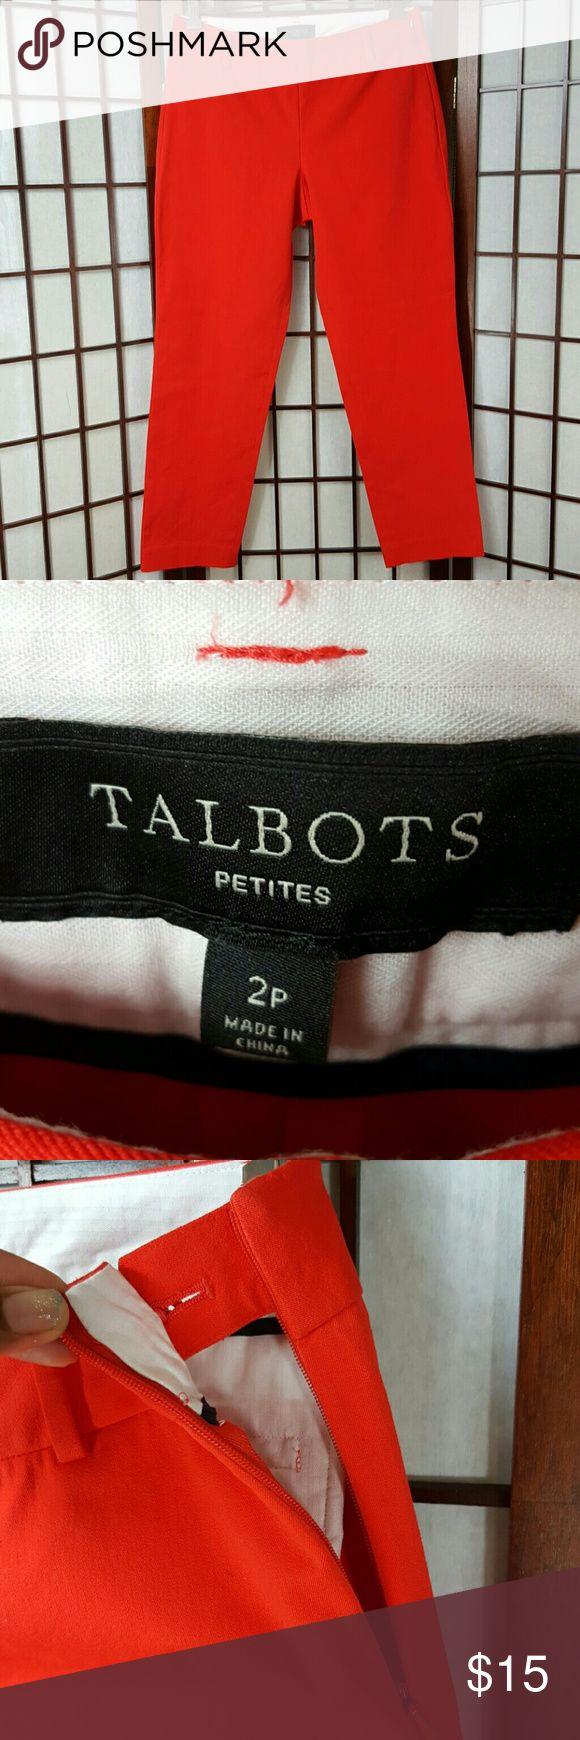 Orange TALBOTS Stretch Ankle Pants Petite 2P Preowned,  excellent condition  TALBOTS petite 2p Orange stretch Ankle pants Talbots Pants